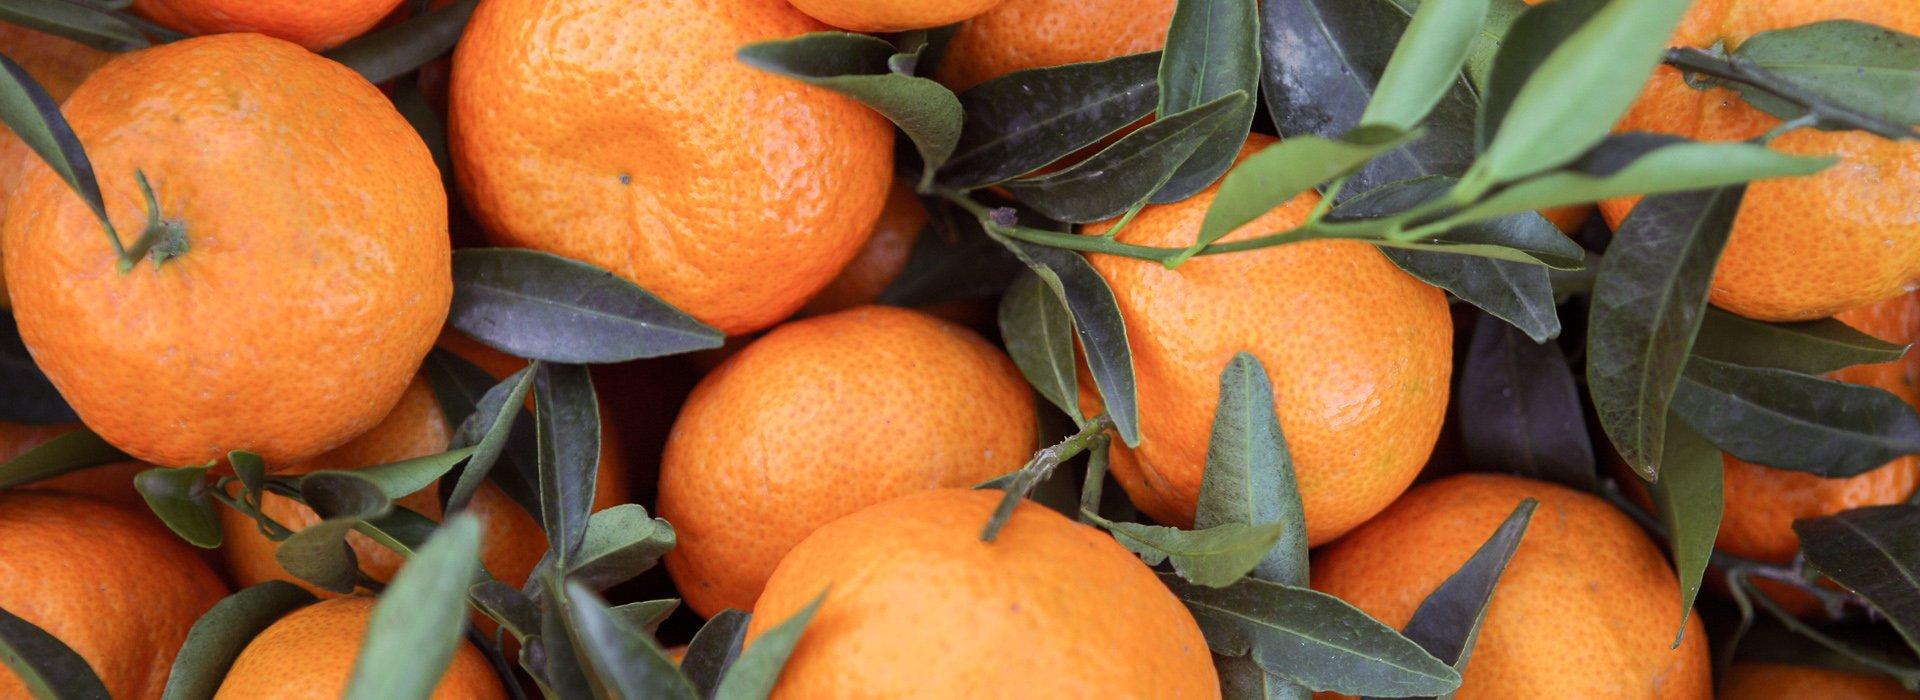 Italian Sicilian tangerines